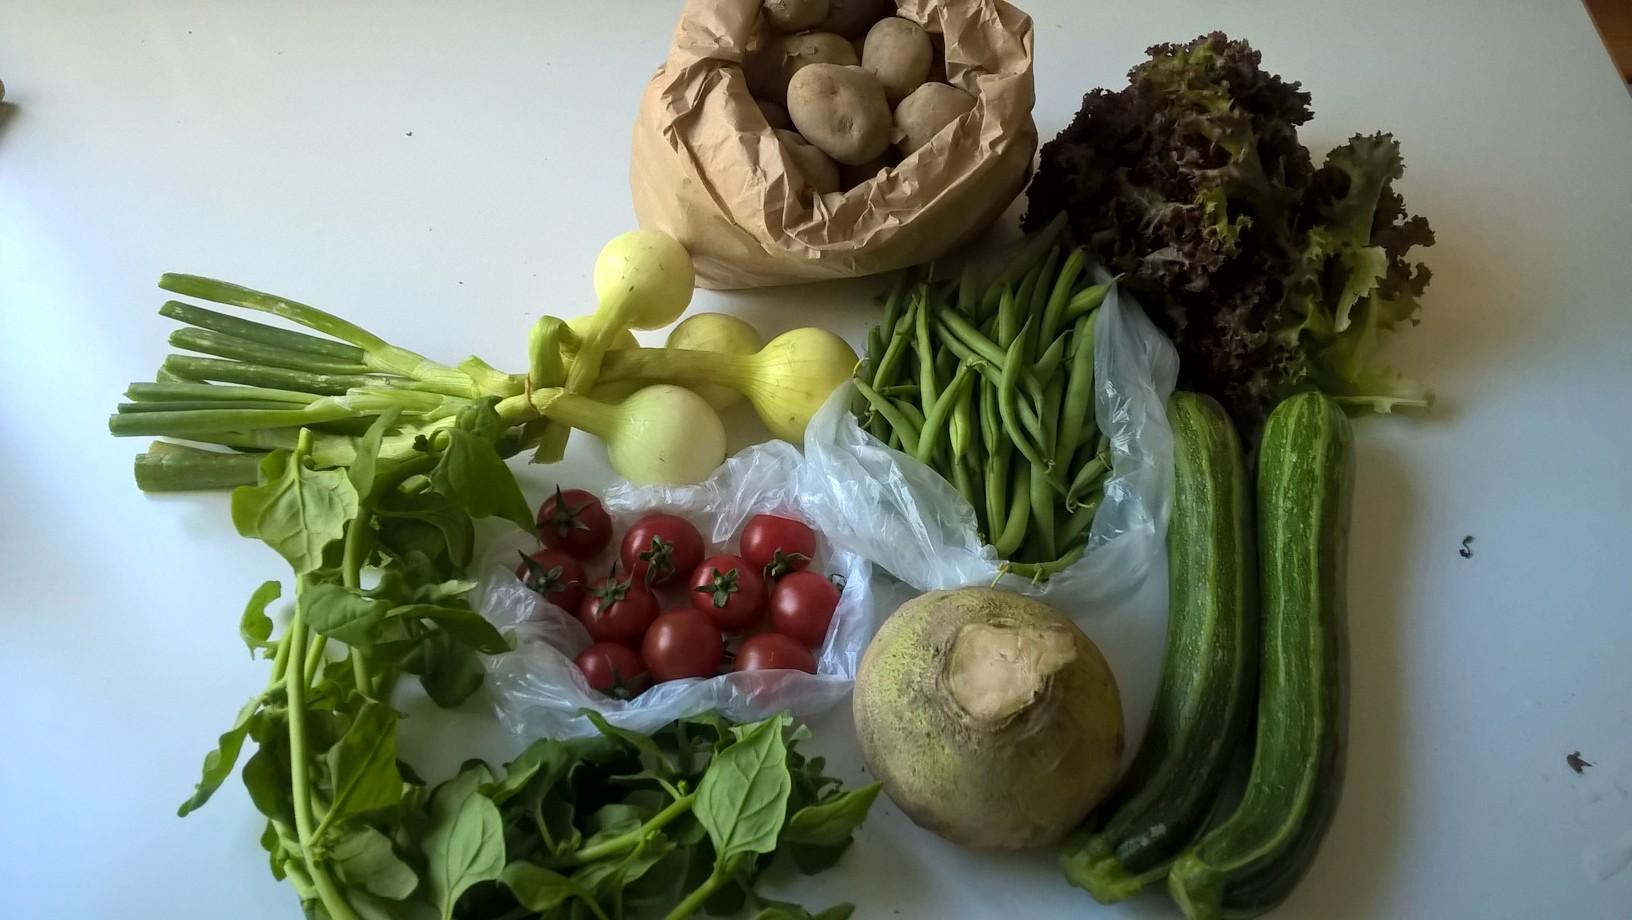 Salaatti 133g, pinaatti 101g, kirsikkatomaatti 245g, peruna 1007g, lanttu 548g, papu 337g, sipuli 515g, kesäkurpitsa 544g